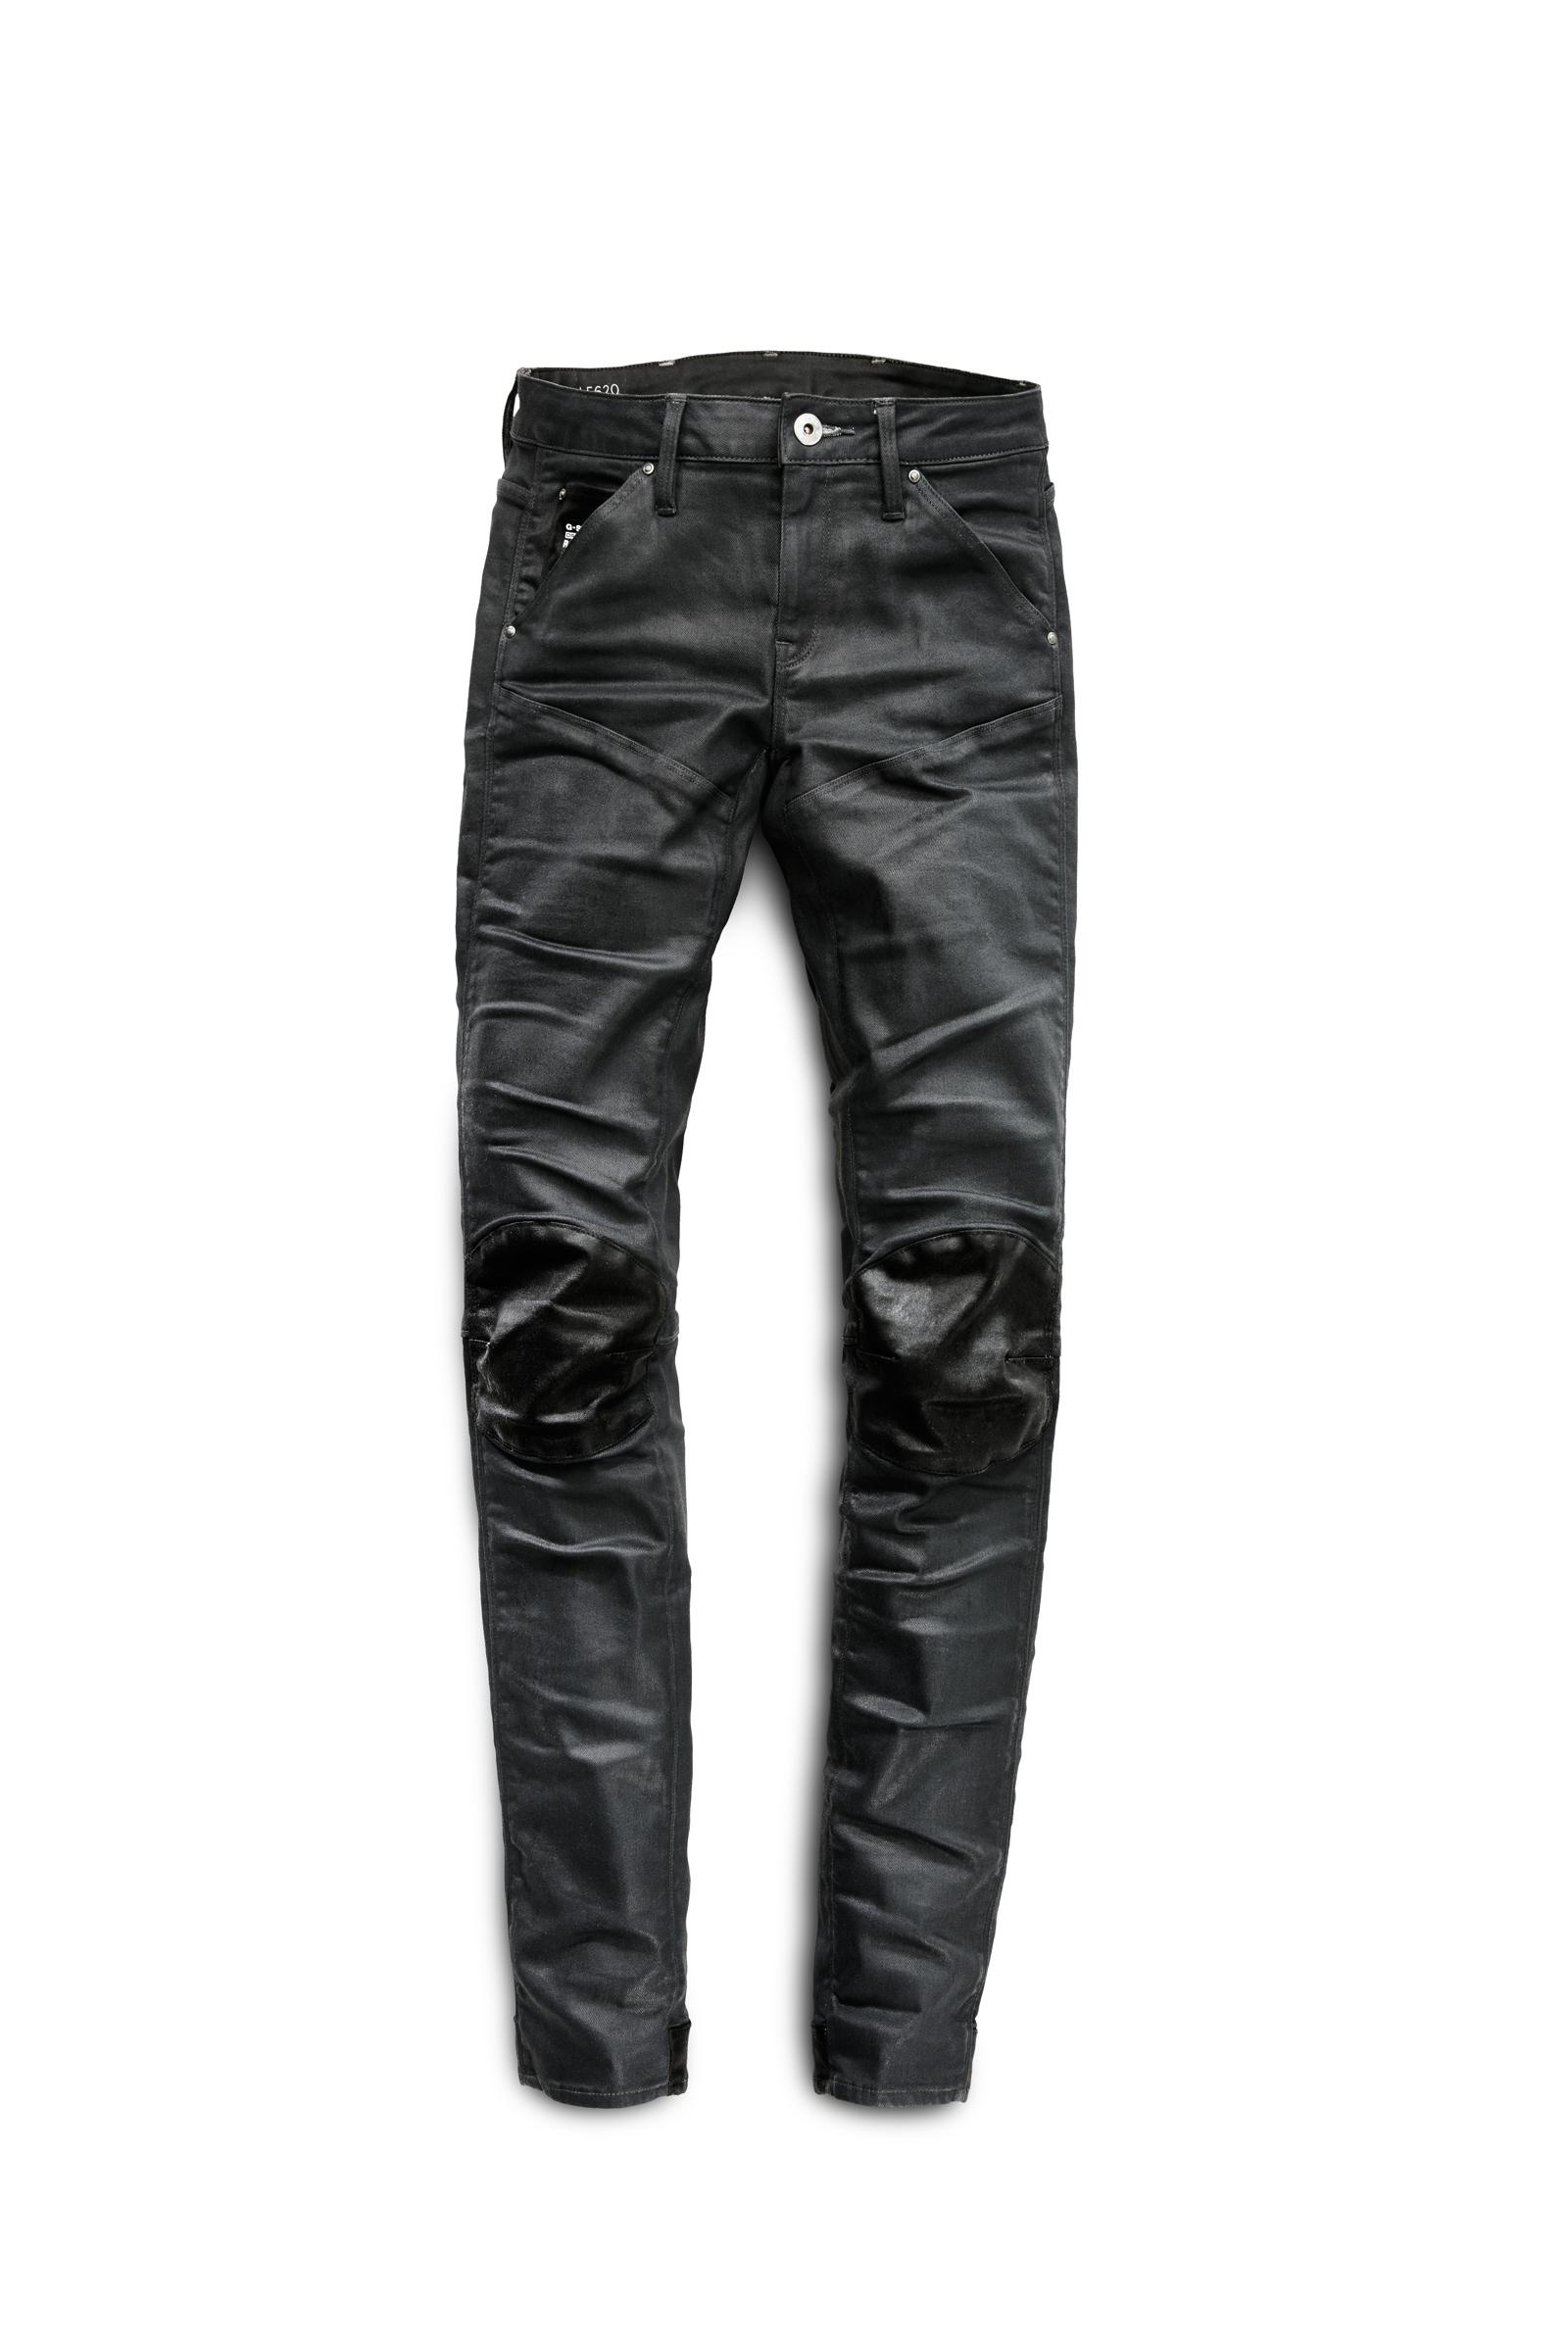 g star elwood 5620 jeans 20 years of style crash. Black Bedroom Furniture Sets. Home Design Ideas